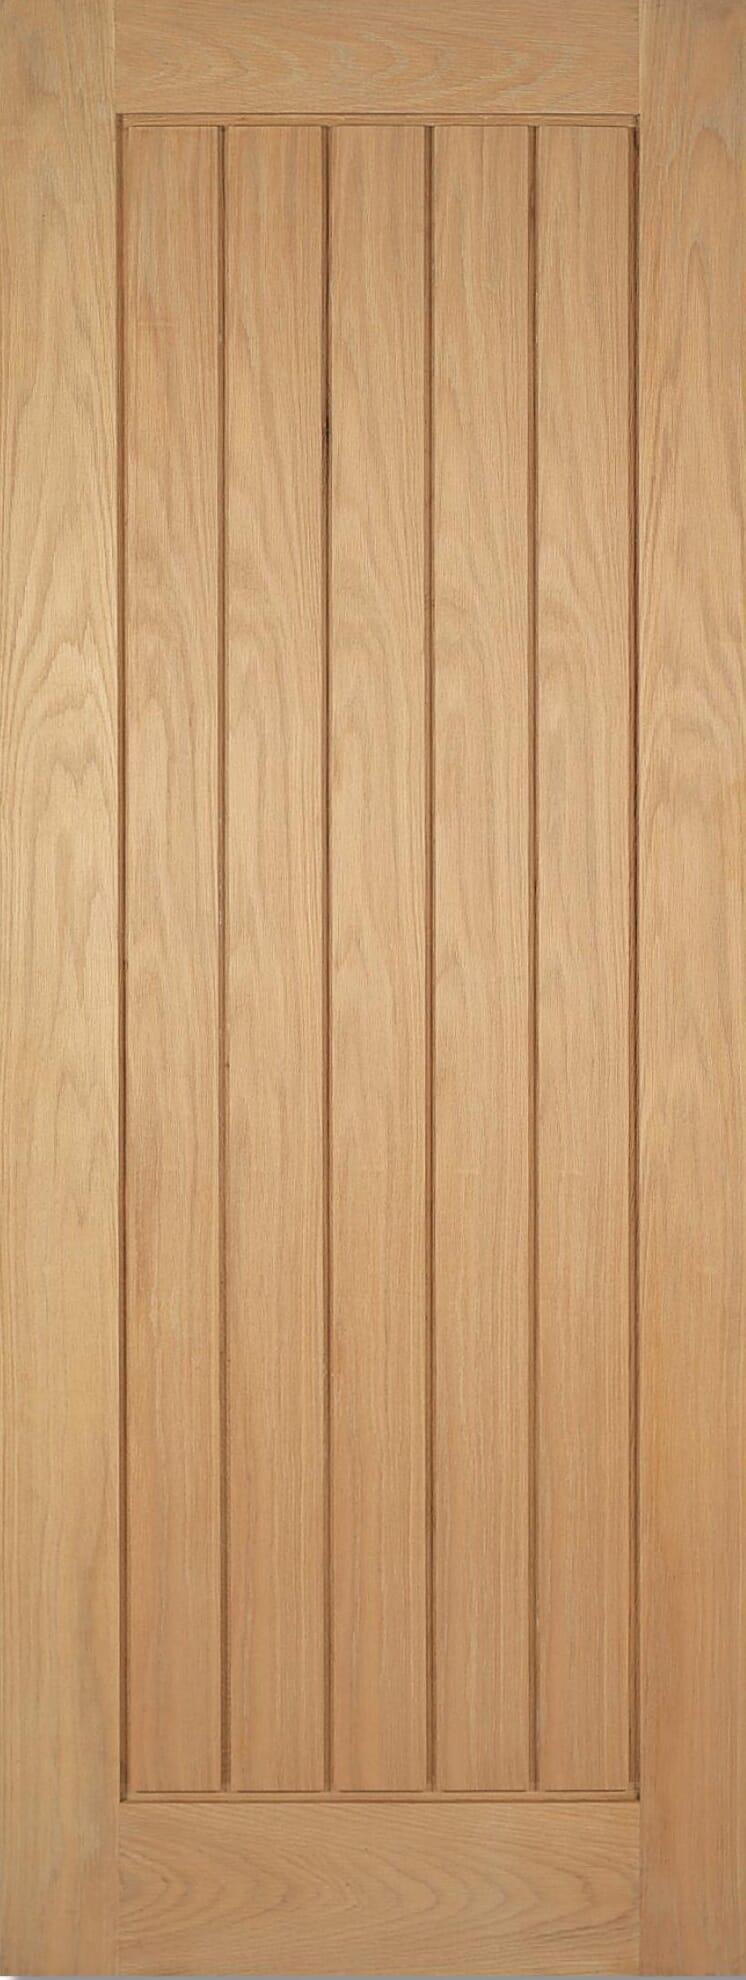 Mexicano Oak - Prefinished Image